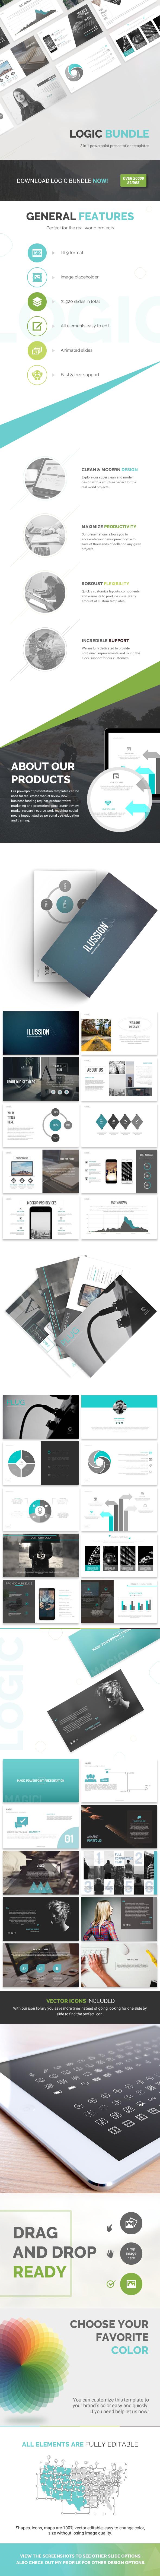 Logic Bundle - 3 in 1 - PowerPoint Templates Presentation Templates